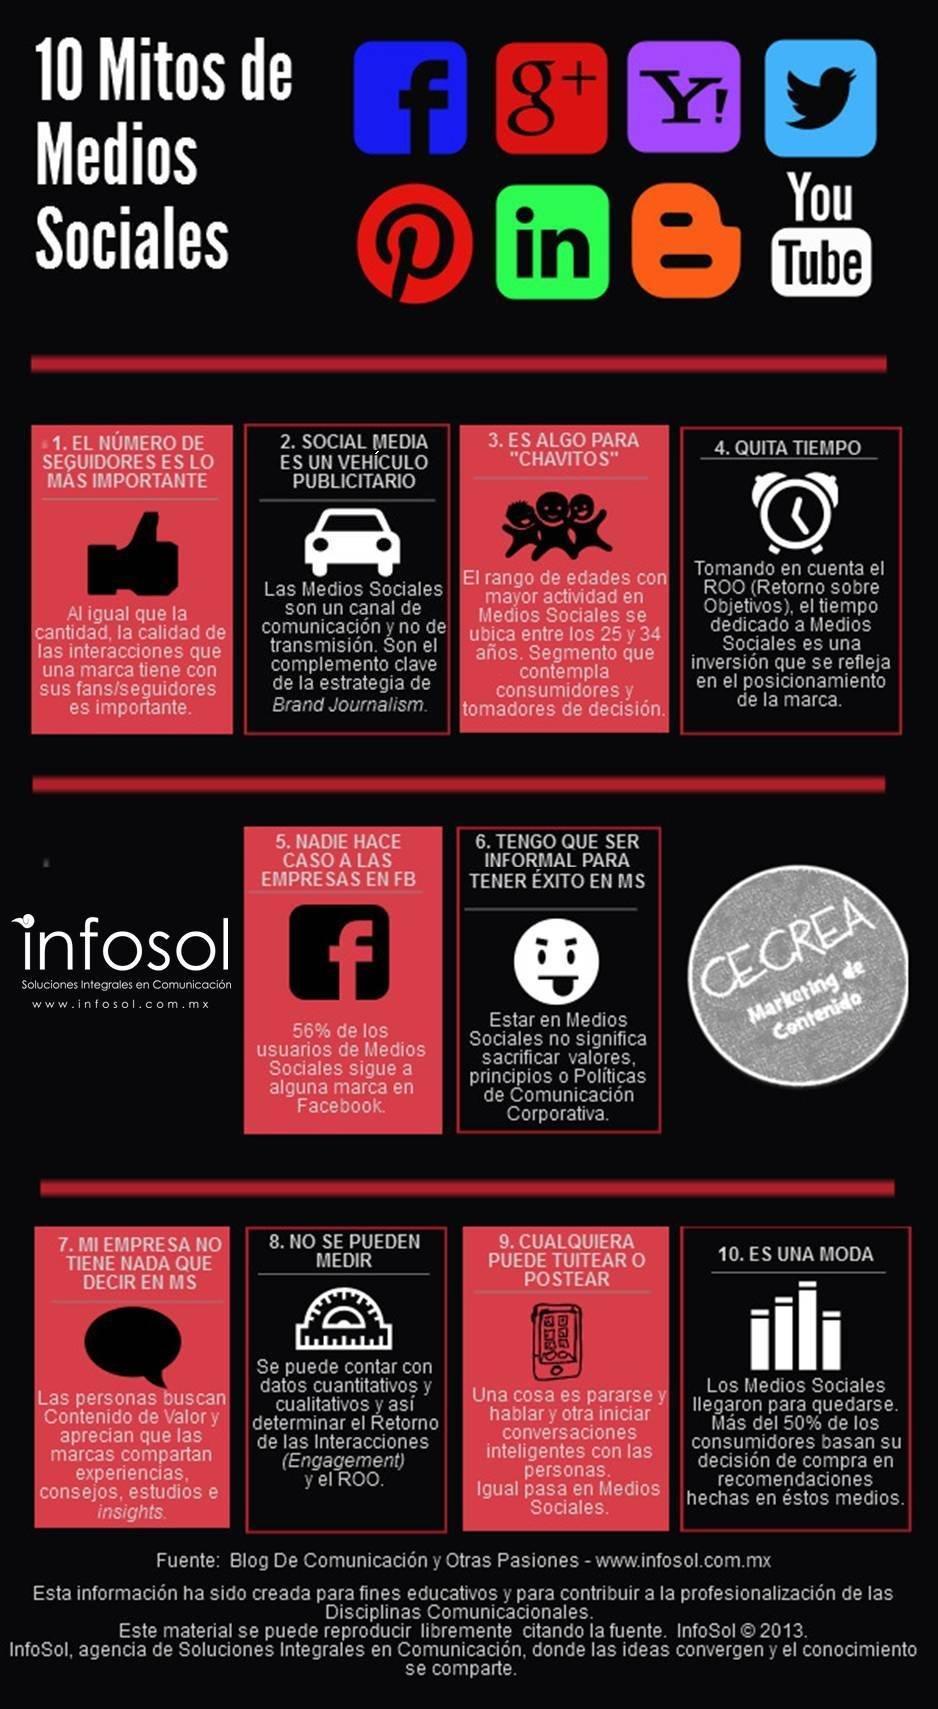 infografia_10_mitos_sobre_redes_sociales